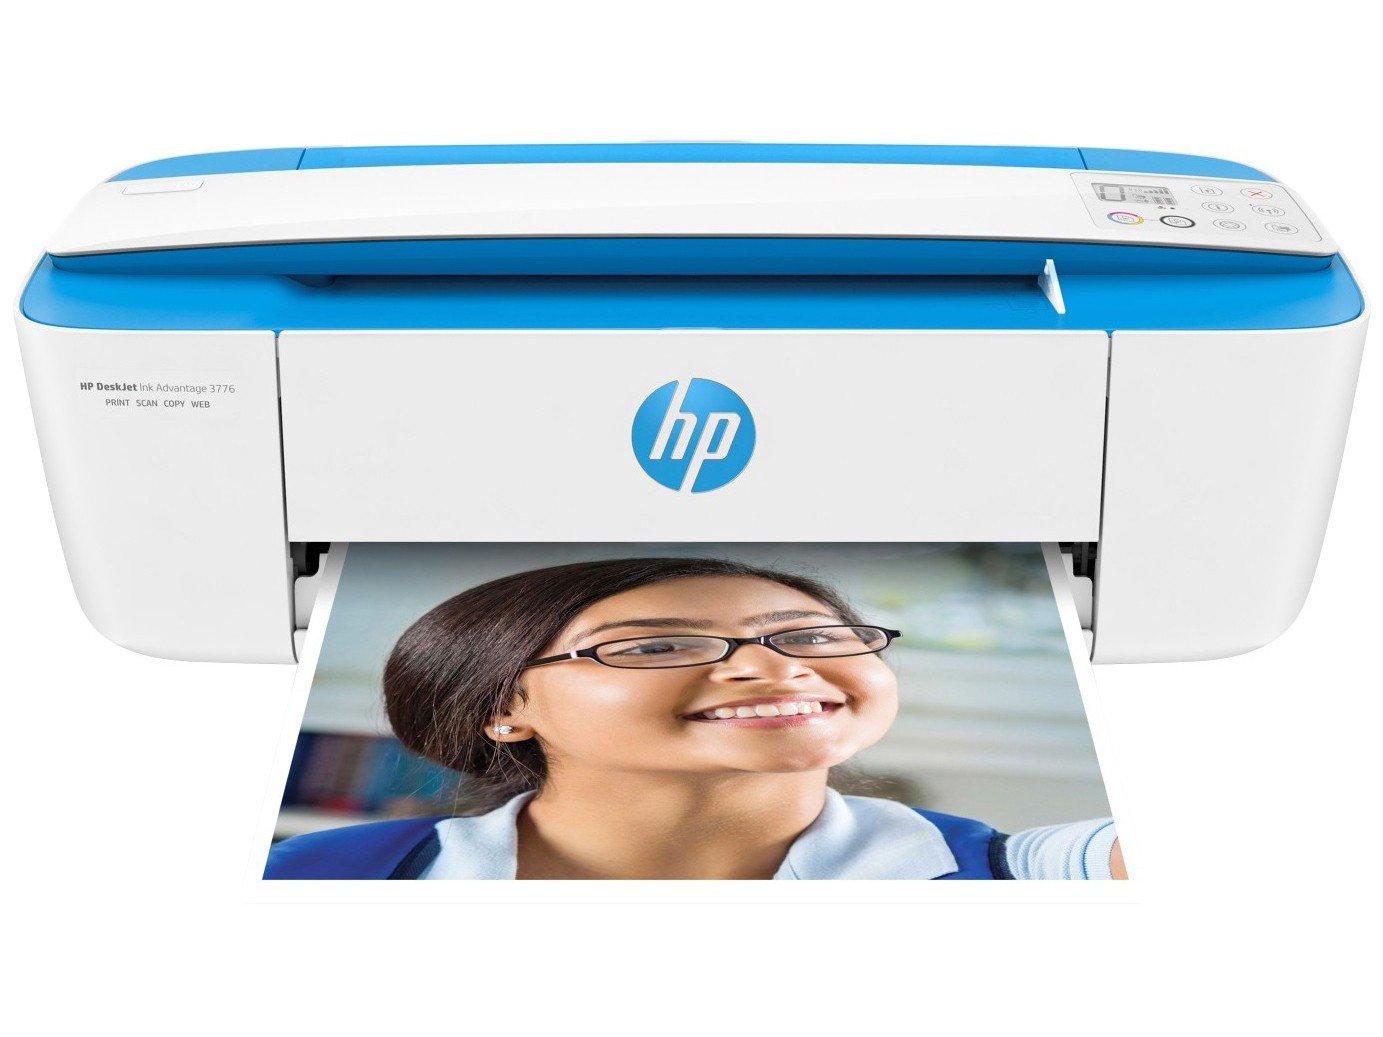 Foto 1 - Impressora Multifuncional HP - DeskJet Ink Advantage 3776 Jato de Tinta Wi-Fi